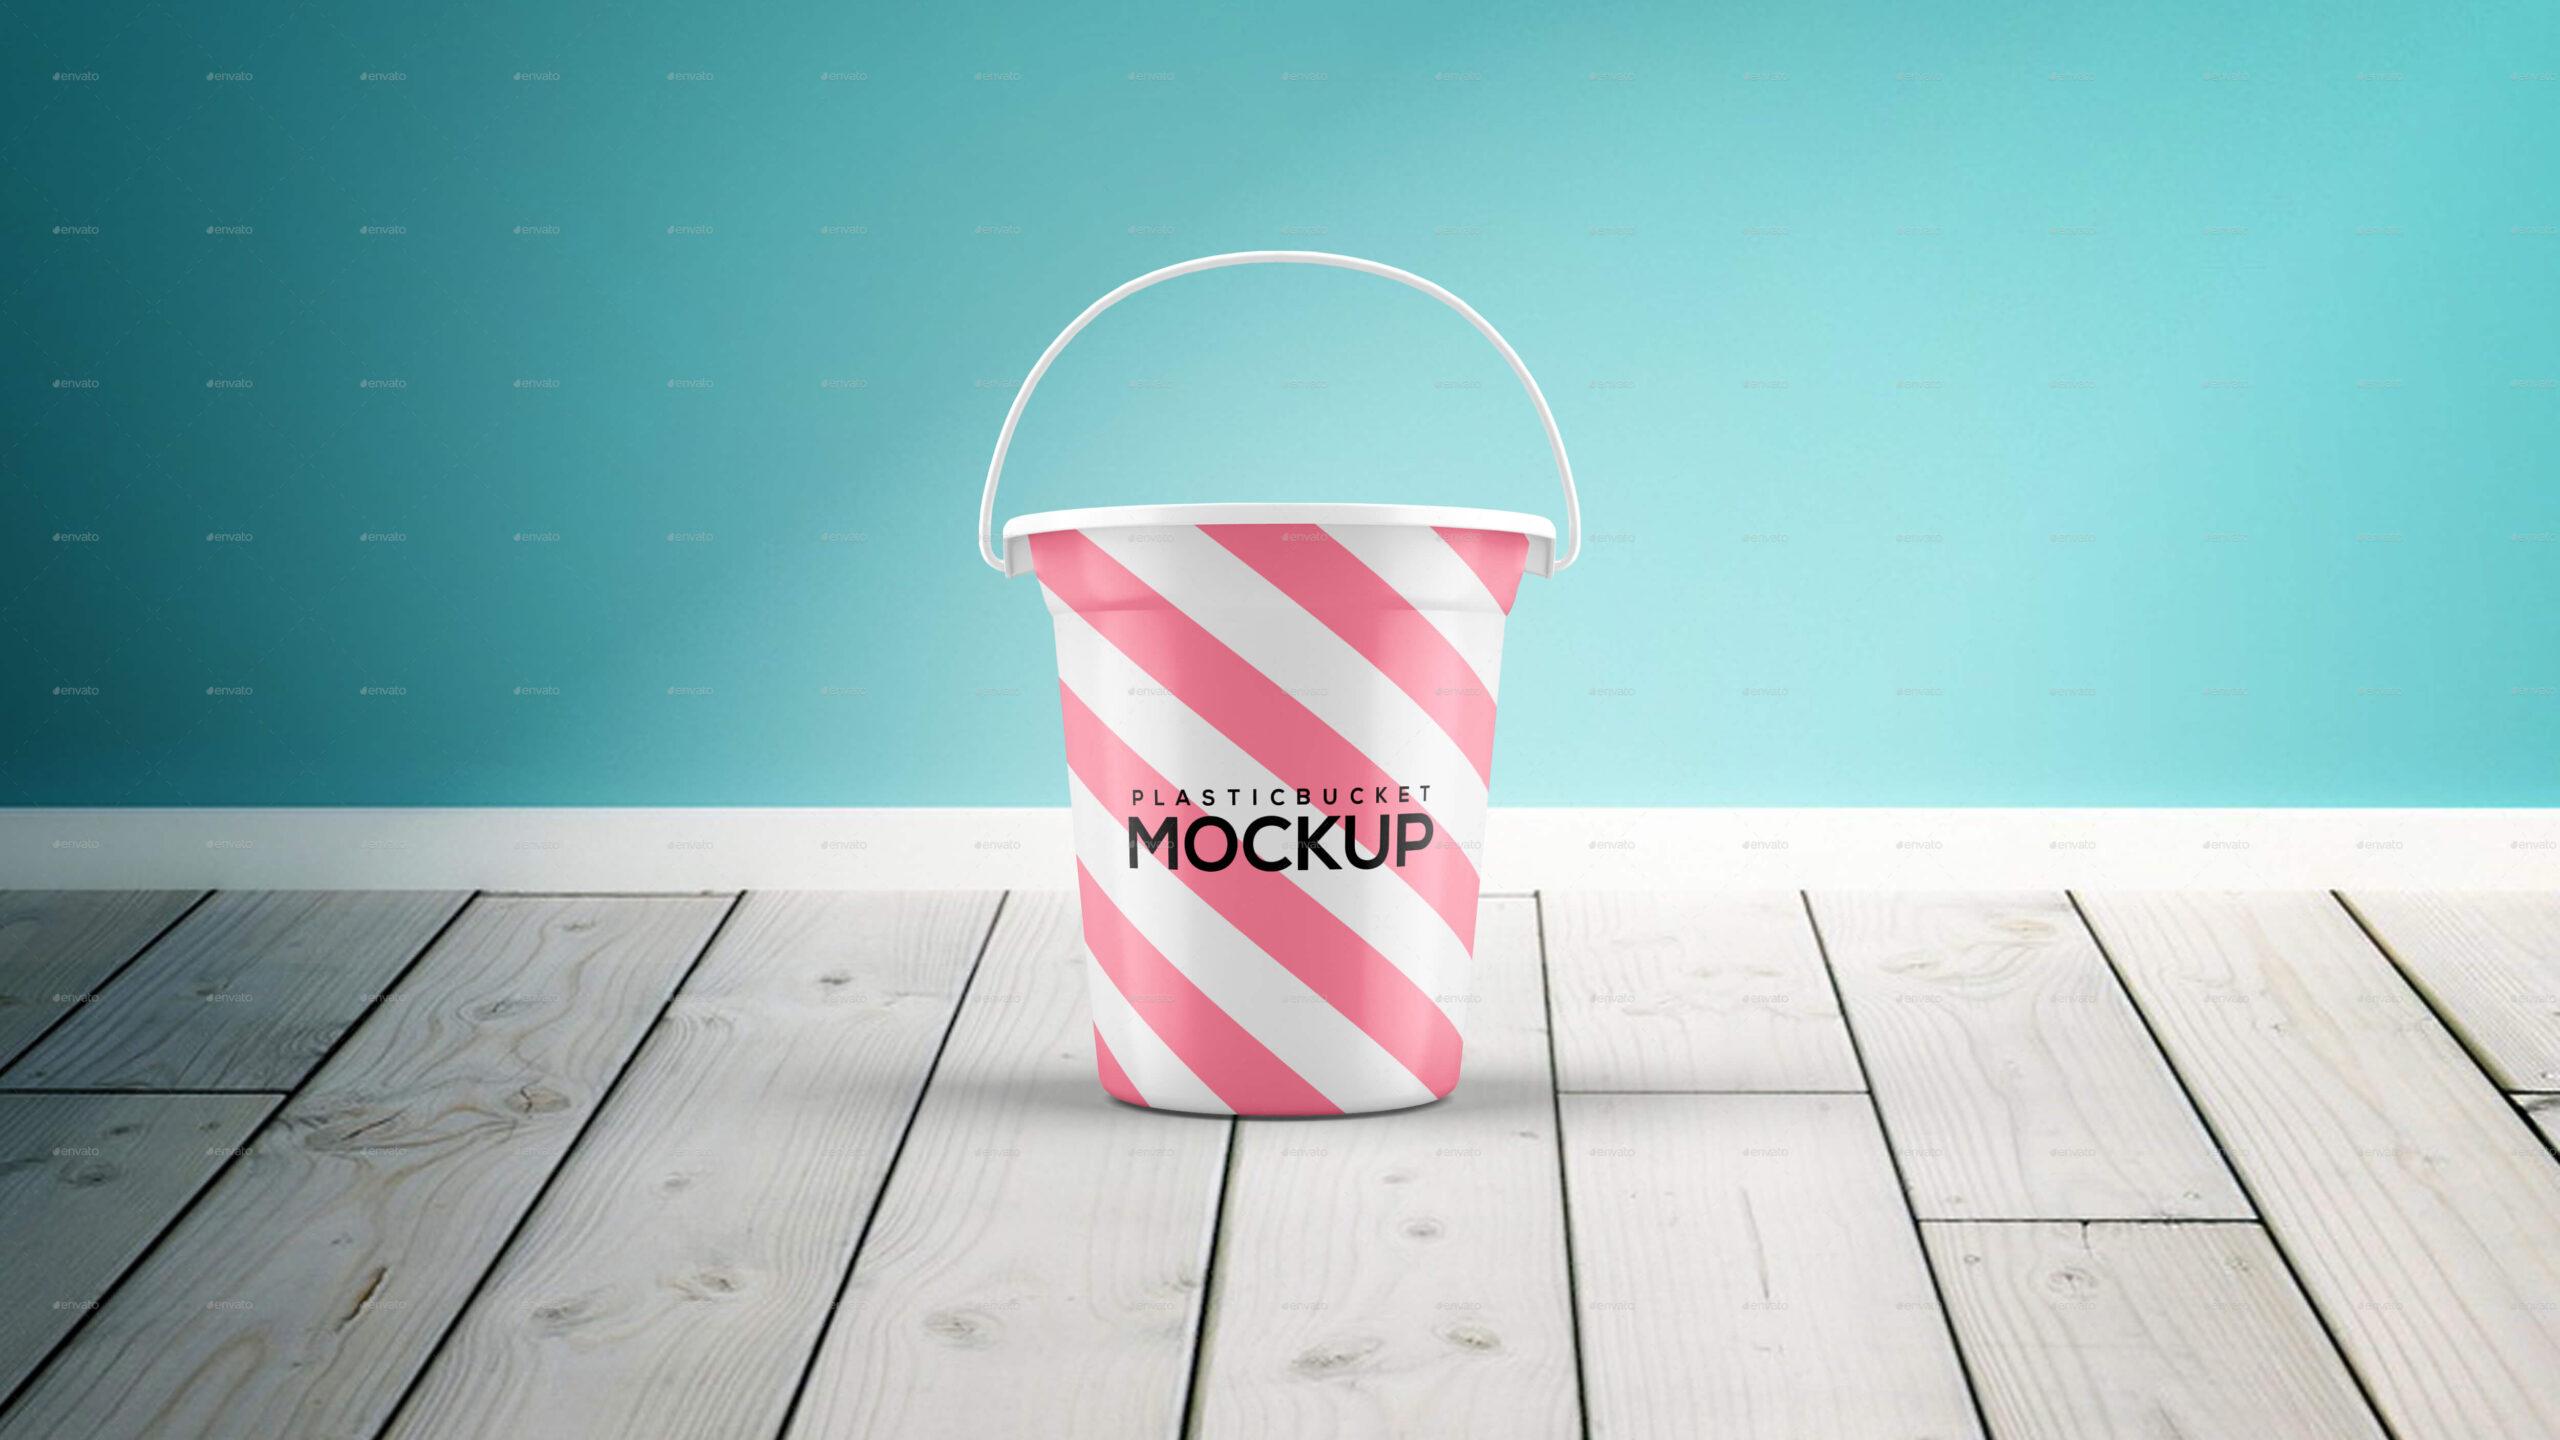 Plastic Bucket Mockup2 (1)